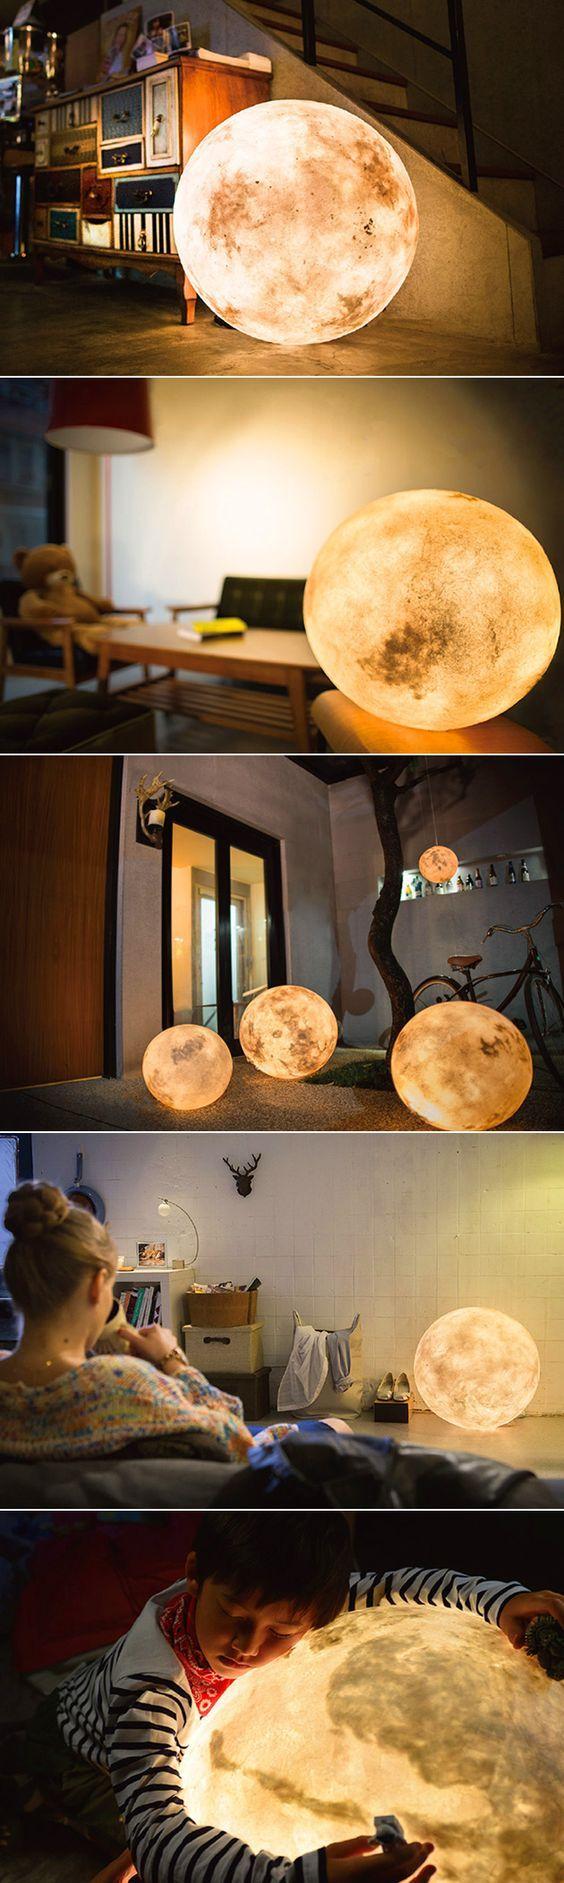 LUNA LAMP | Luna: A Lantern That Looks Like a Moon | www.bocadolobo.com/ #lightingideas #lighting ...repinned für Gewinner!  - jetzt gratis Erfolgsratgeber sichern www.ratsucher.de